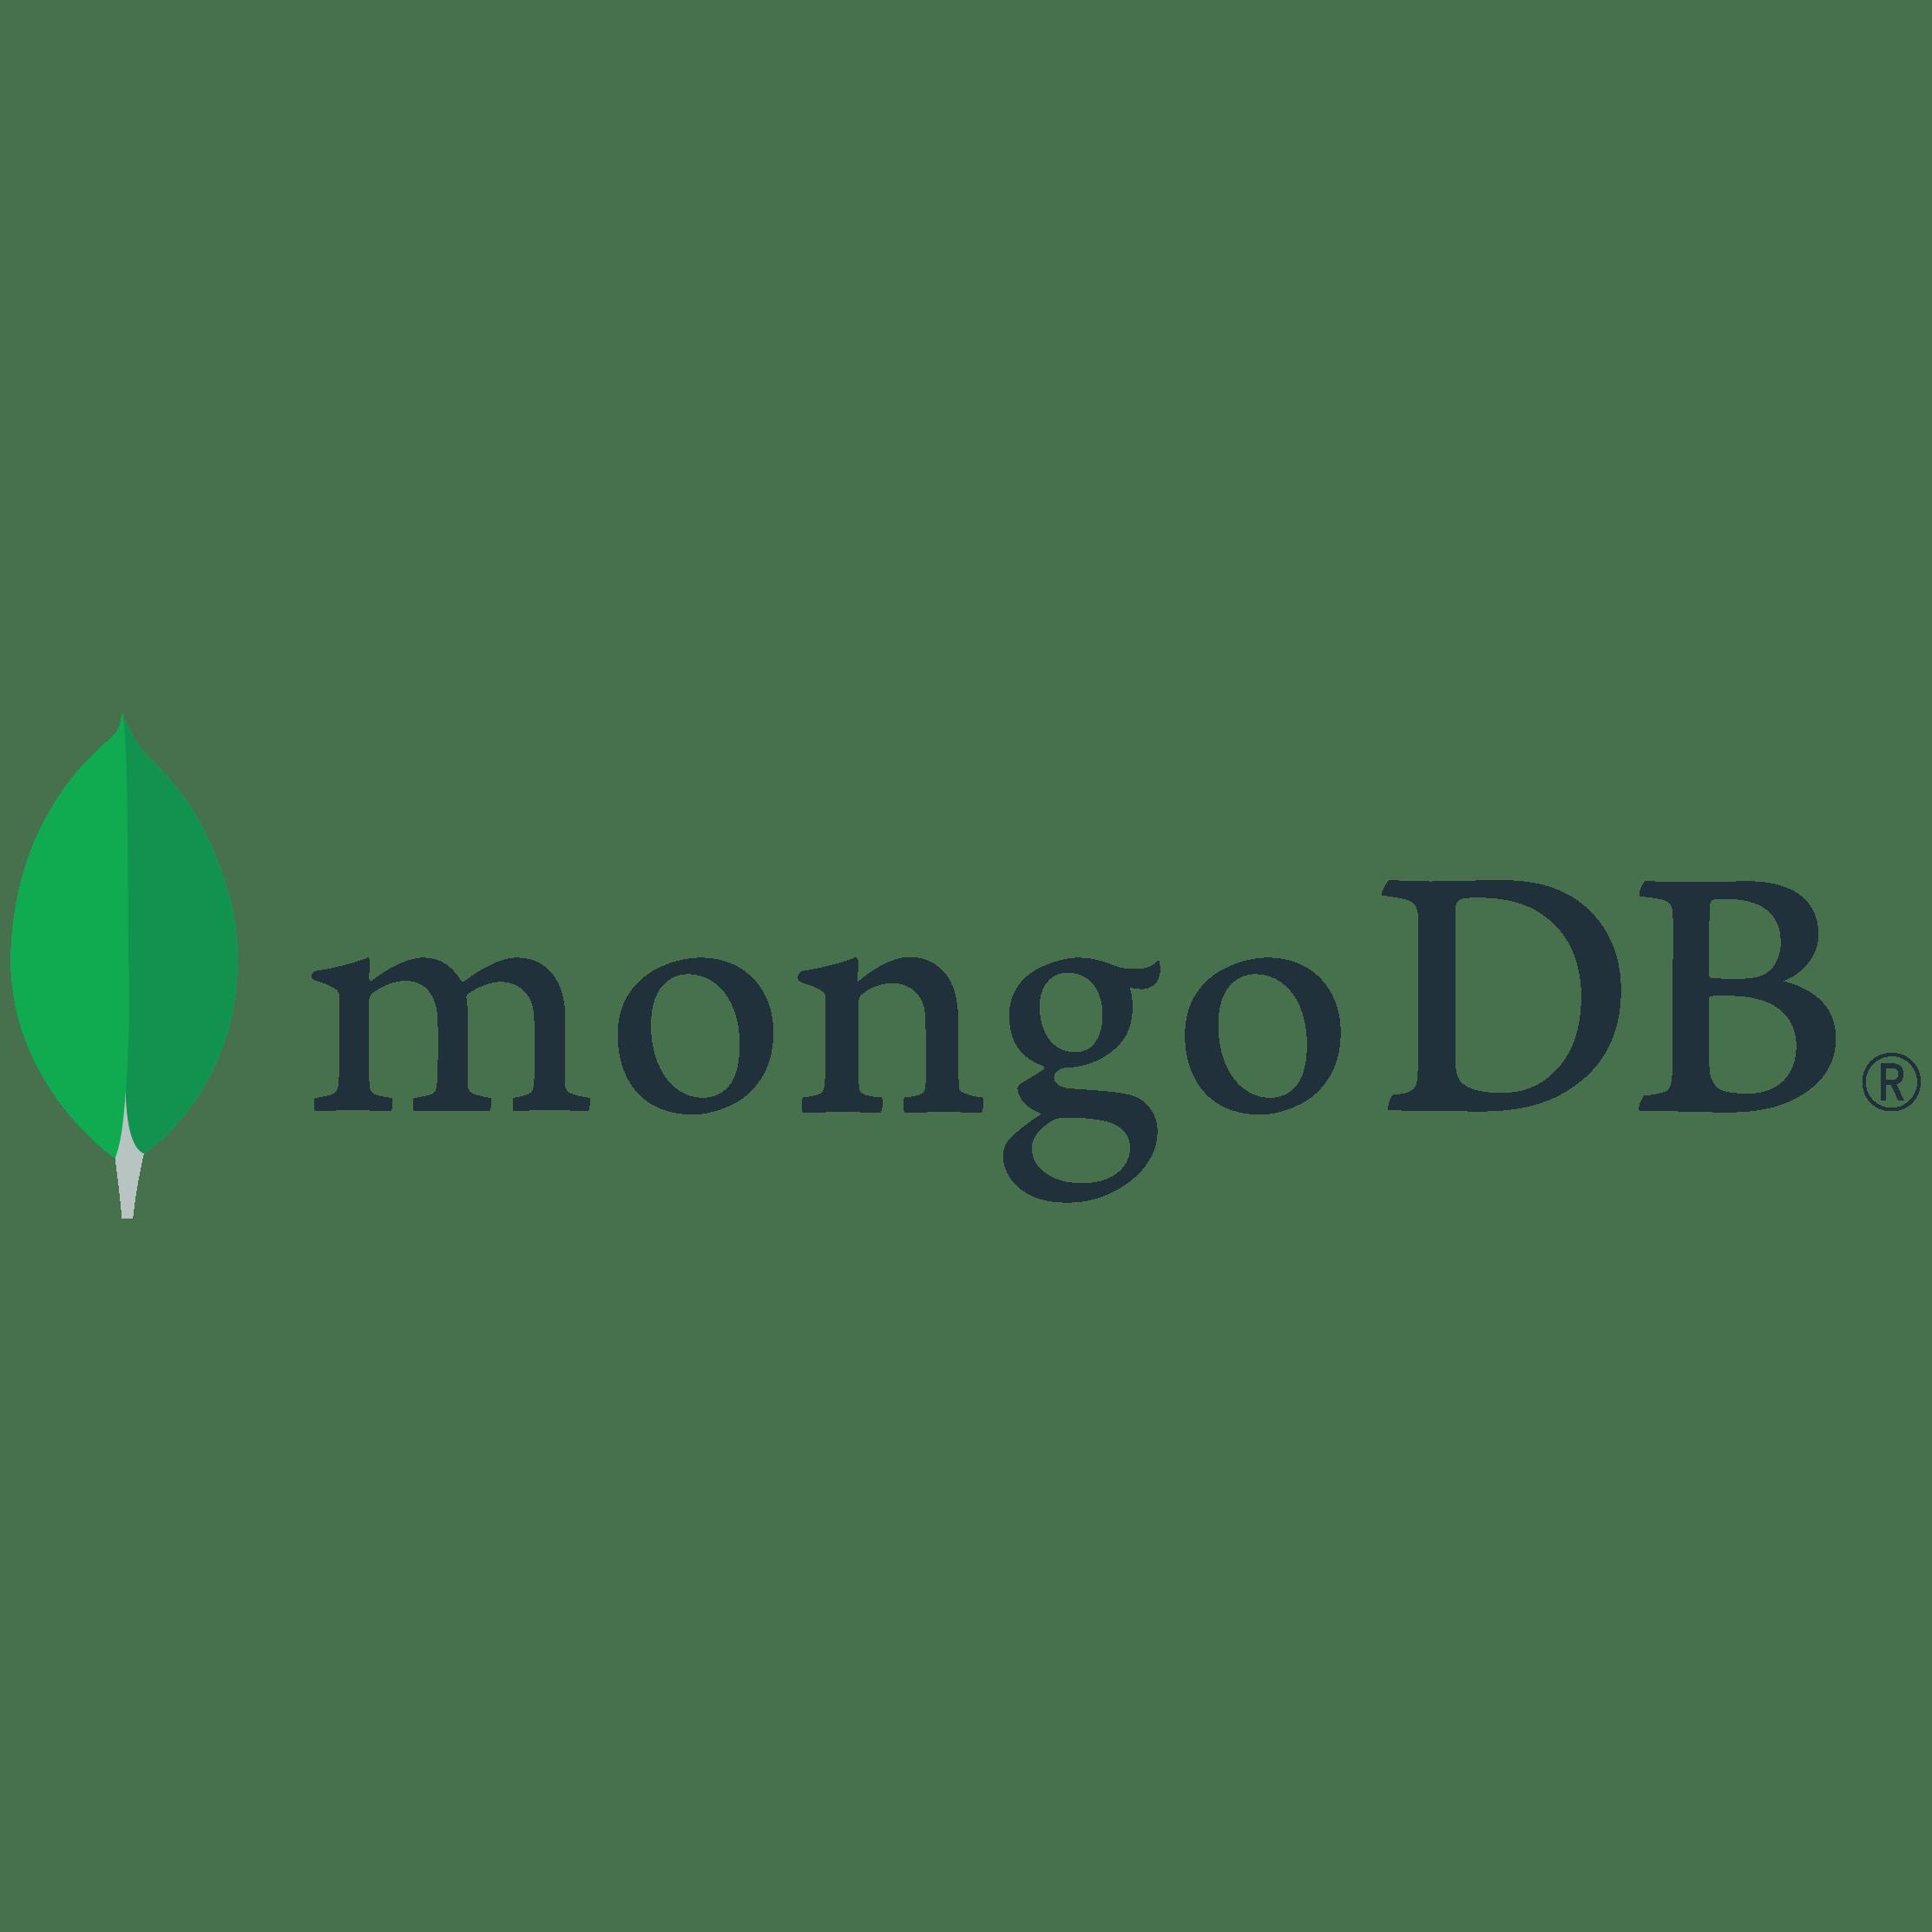 mongoDB | Fundamentale Aktienanalyse